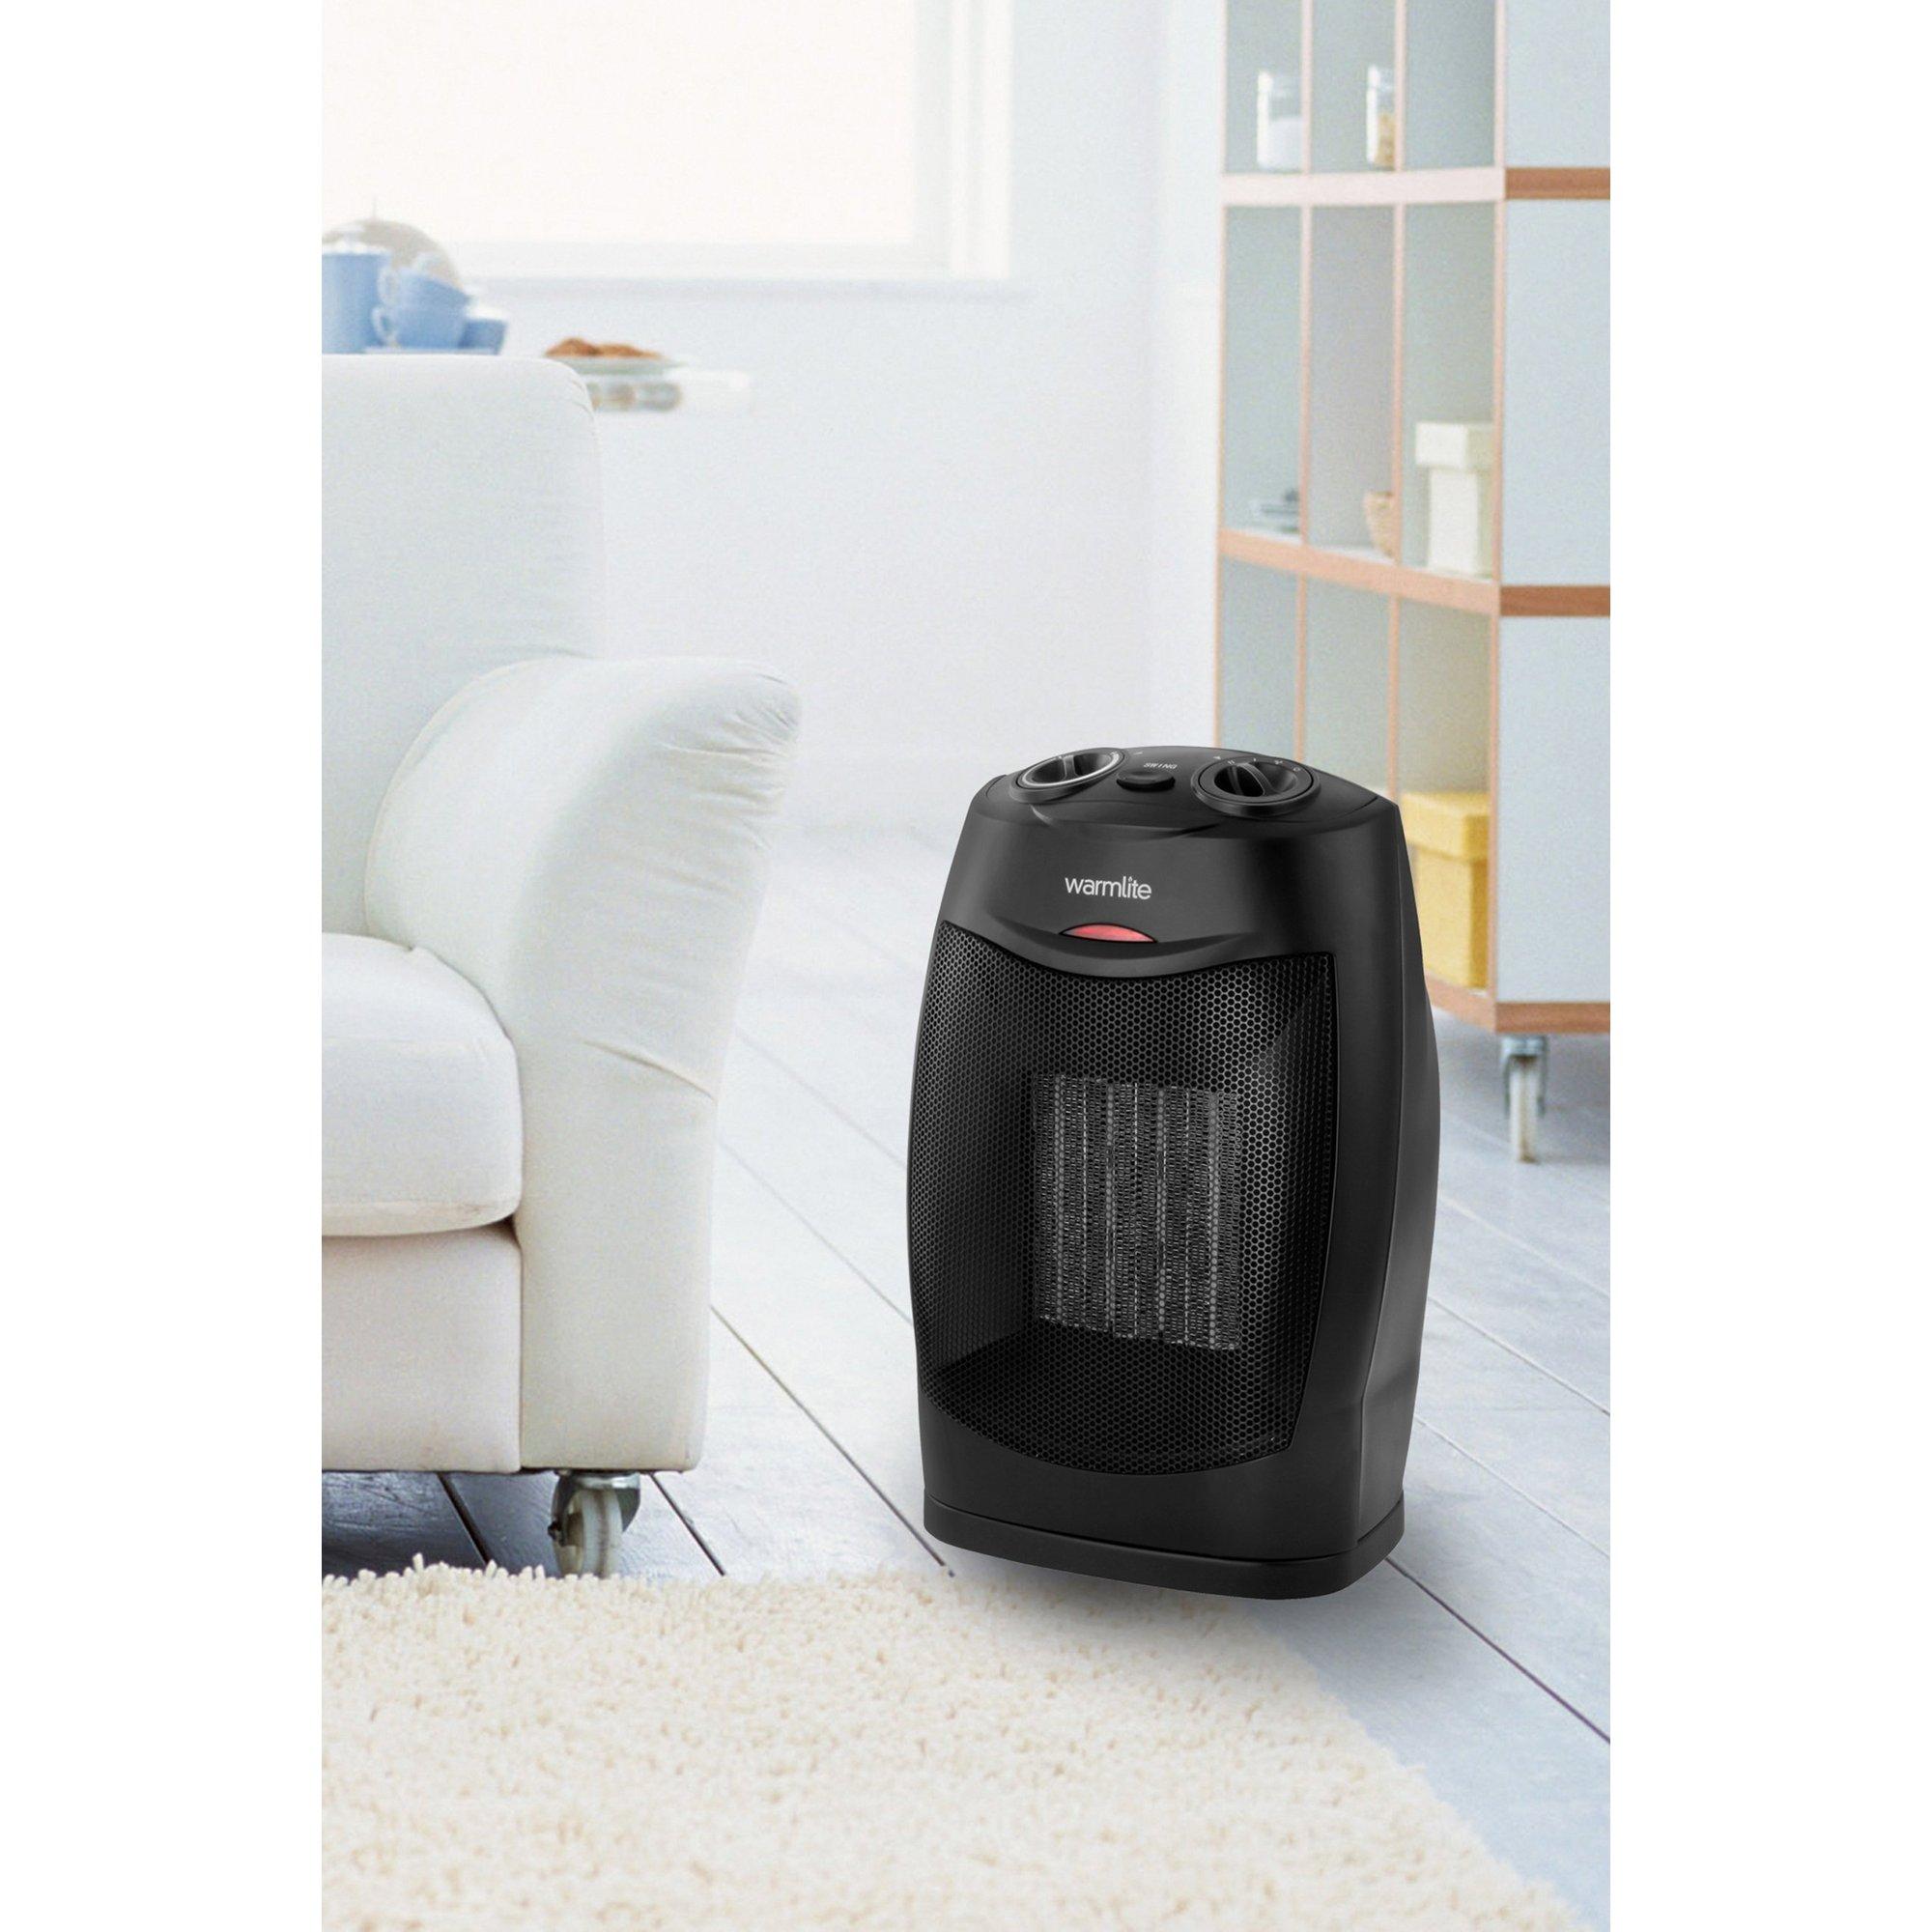 Warmlite 1500W Ceramic PTC Fan Heater